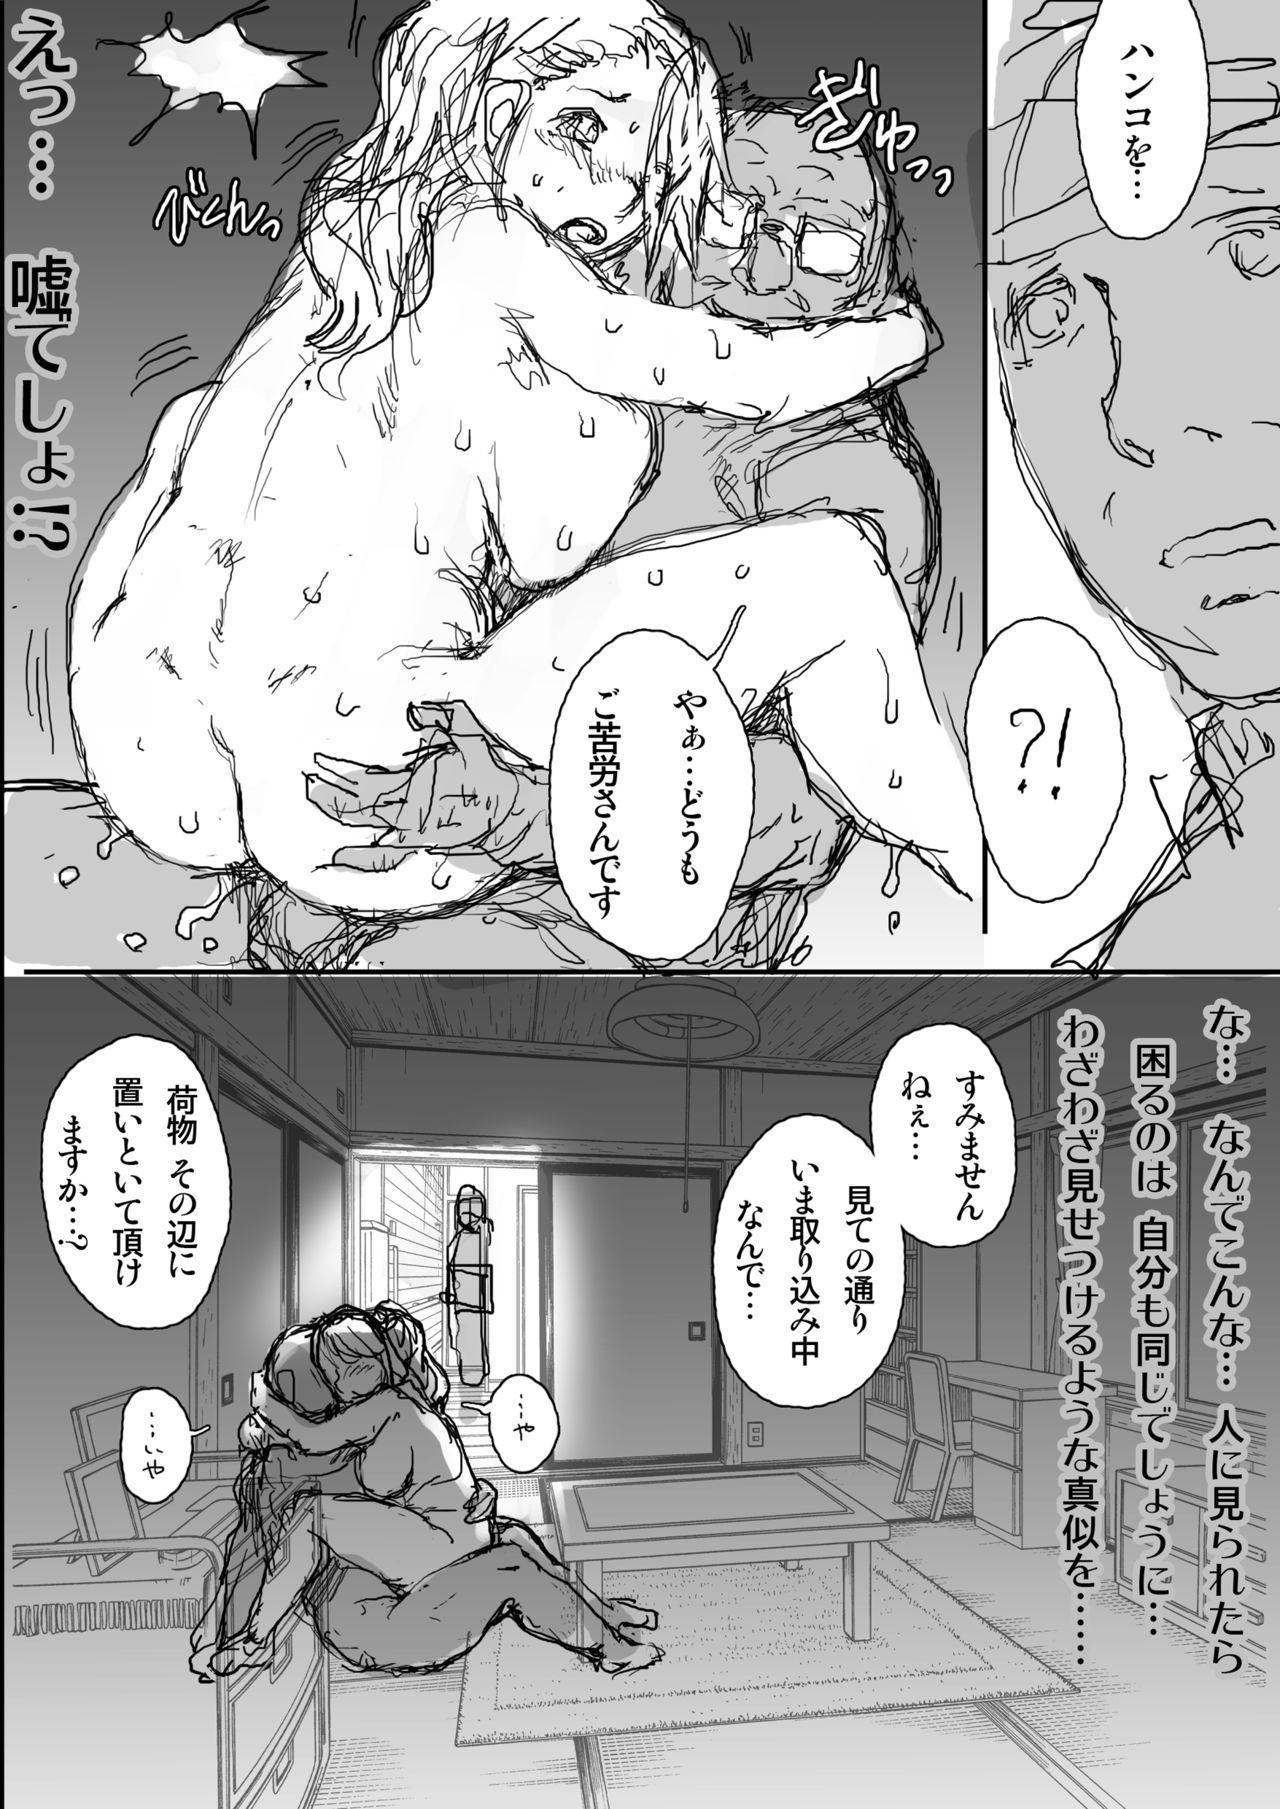 [Studio Tapa Tapa (Sengoku-kun)] Daddy-Long-Legs #3 (Gundam Build Fighters Try) [Digital] 66